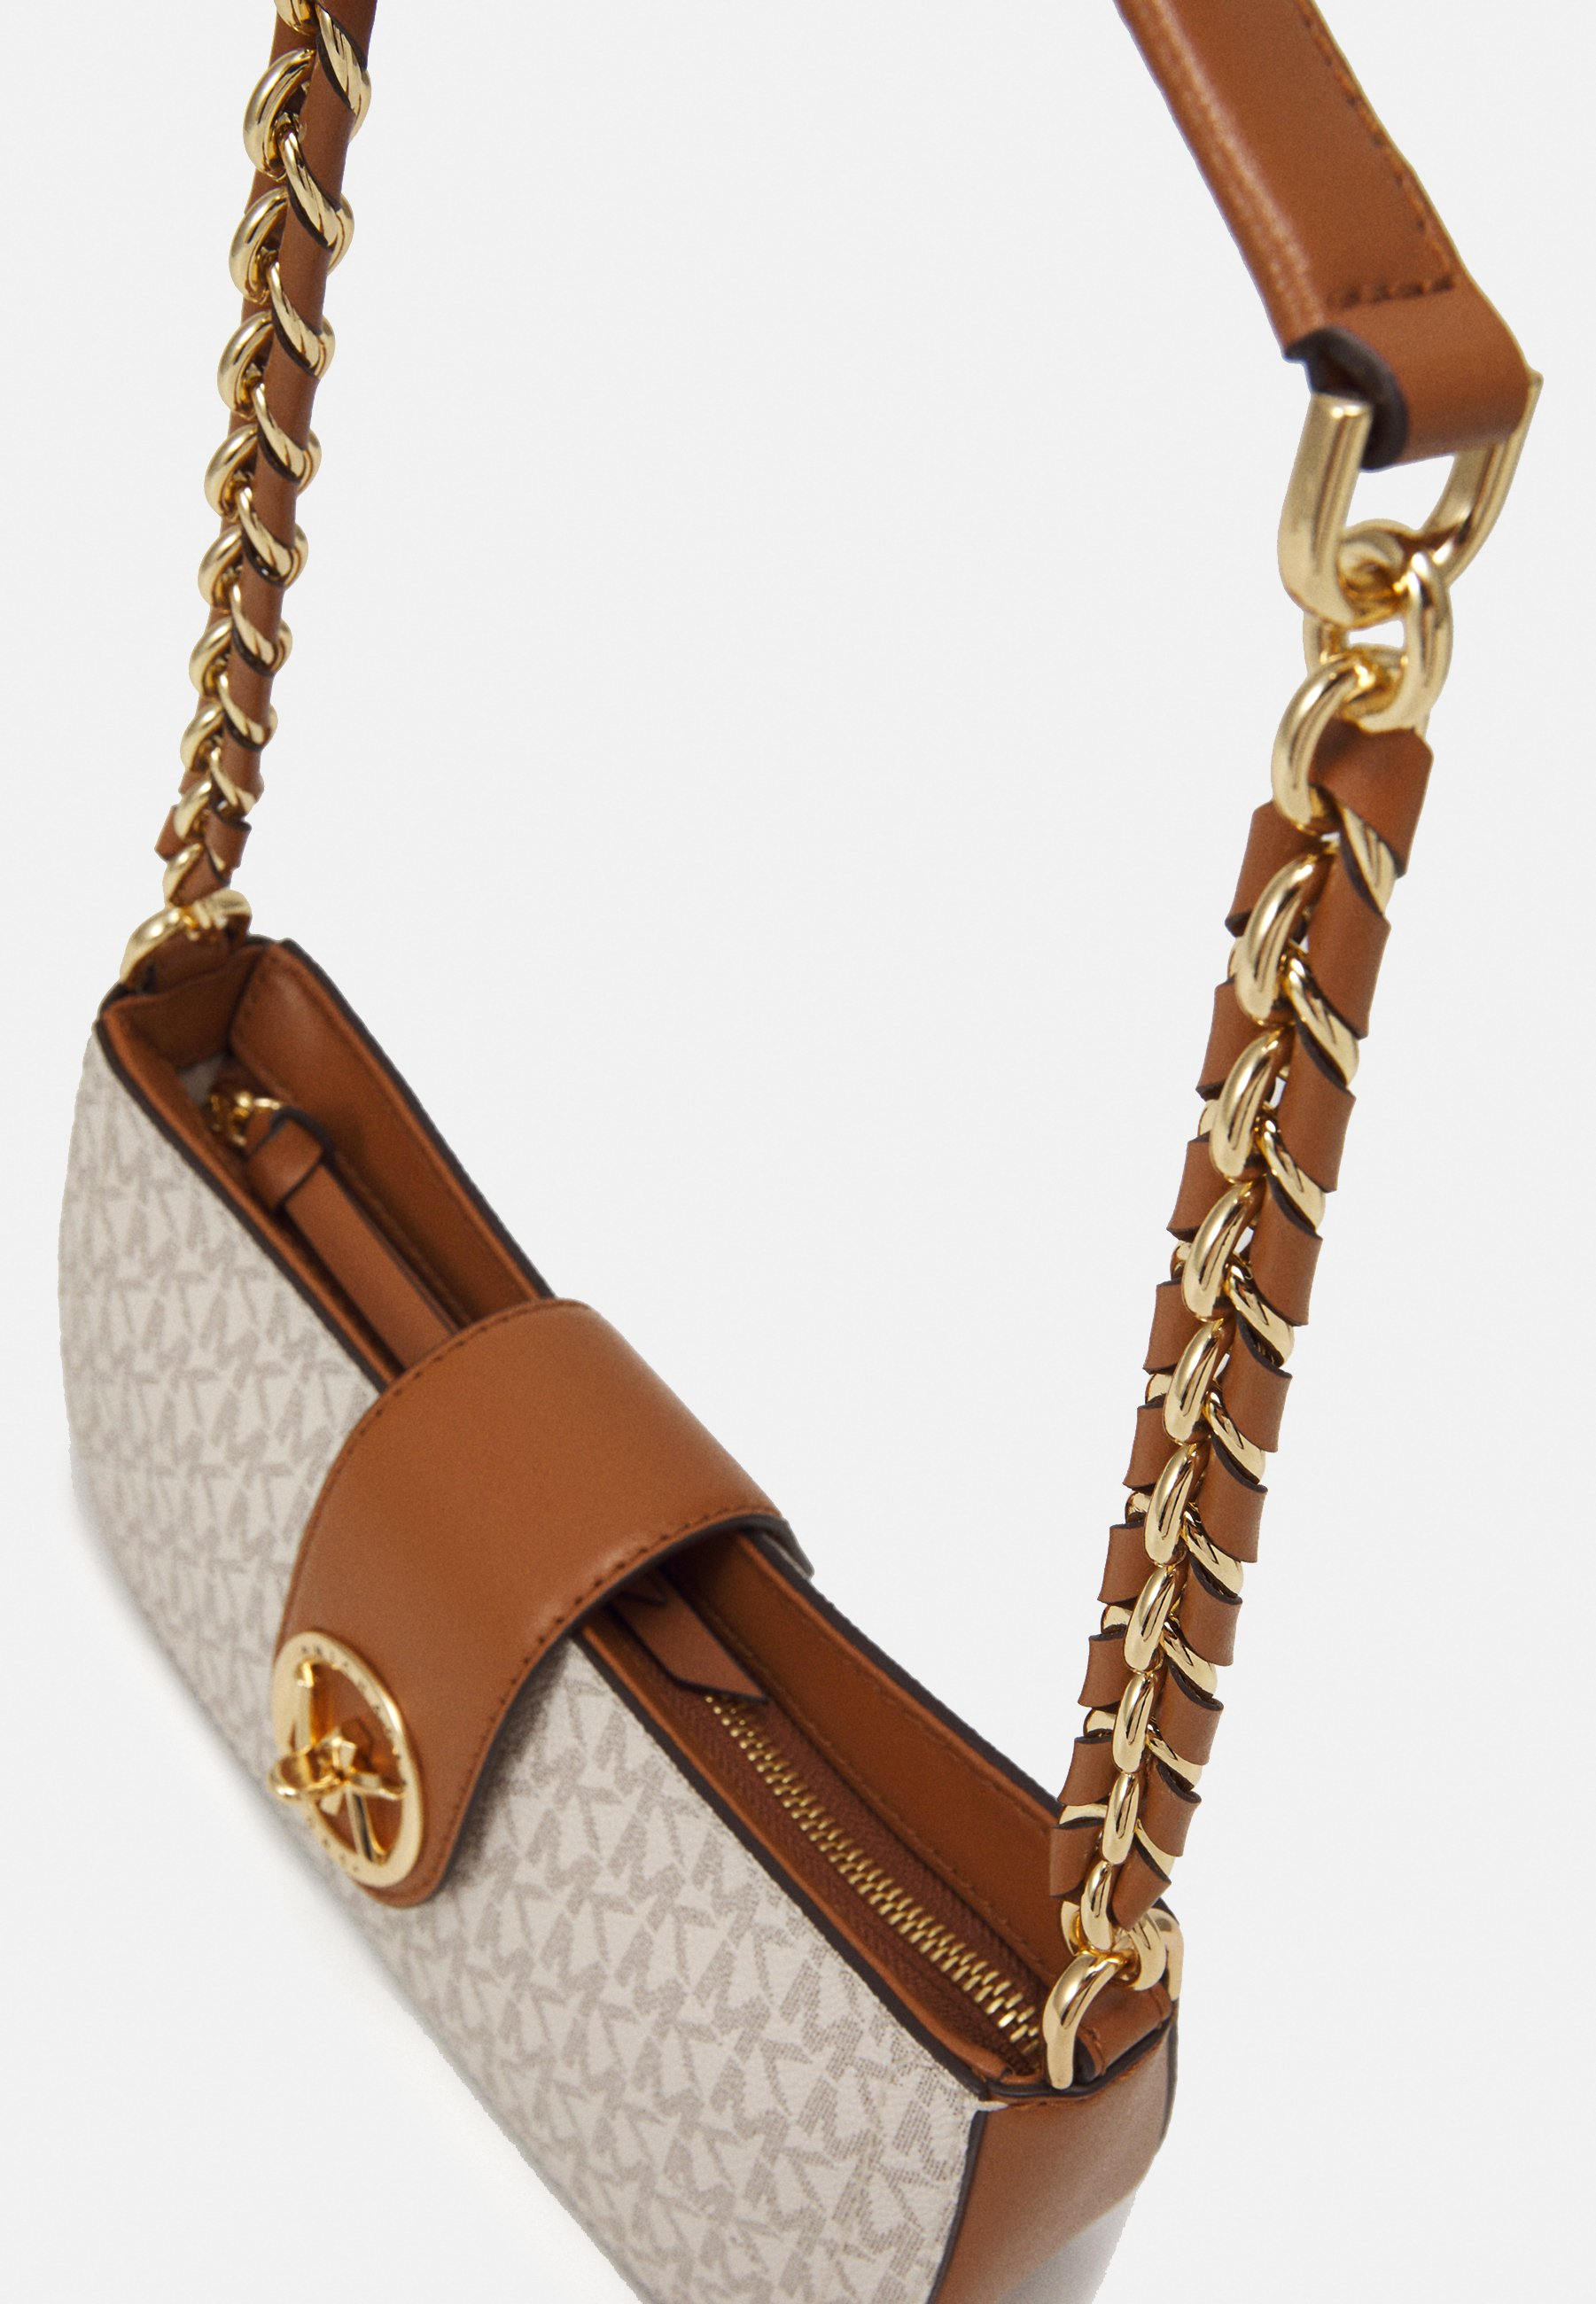 Damen CARMEN POUCHETTE - Handtasche